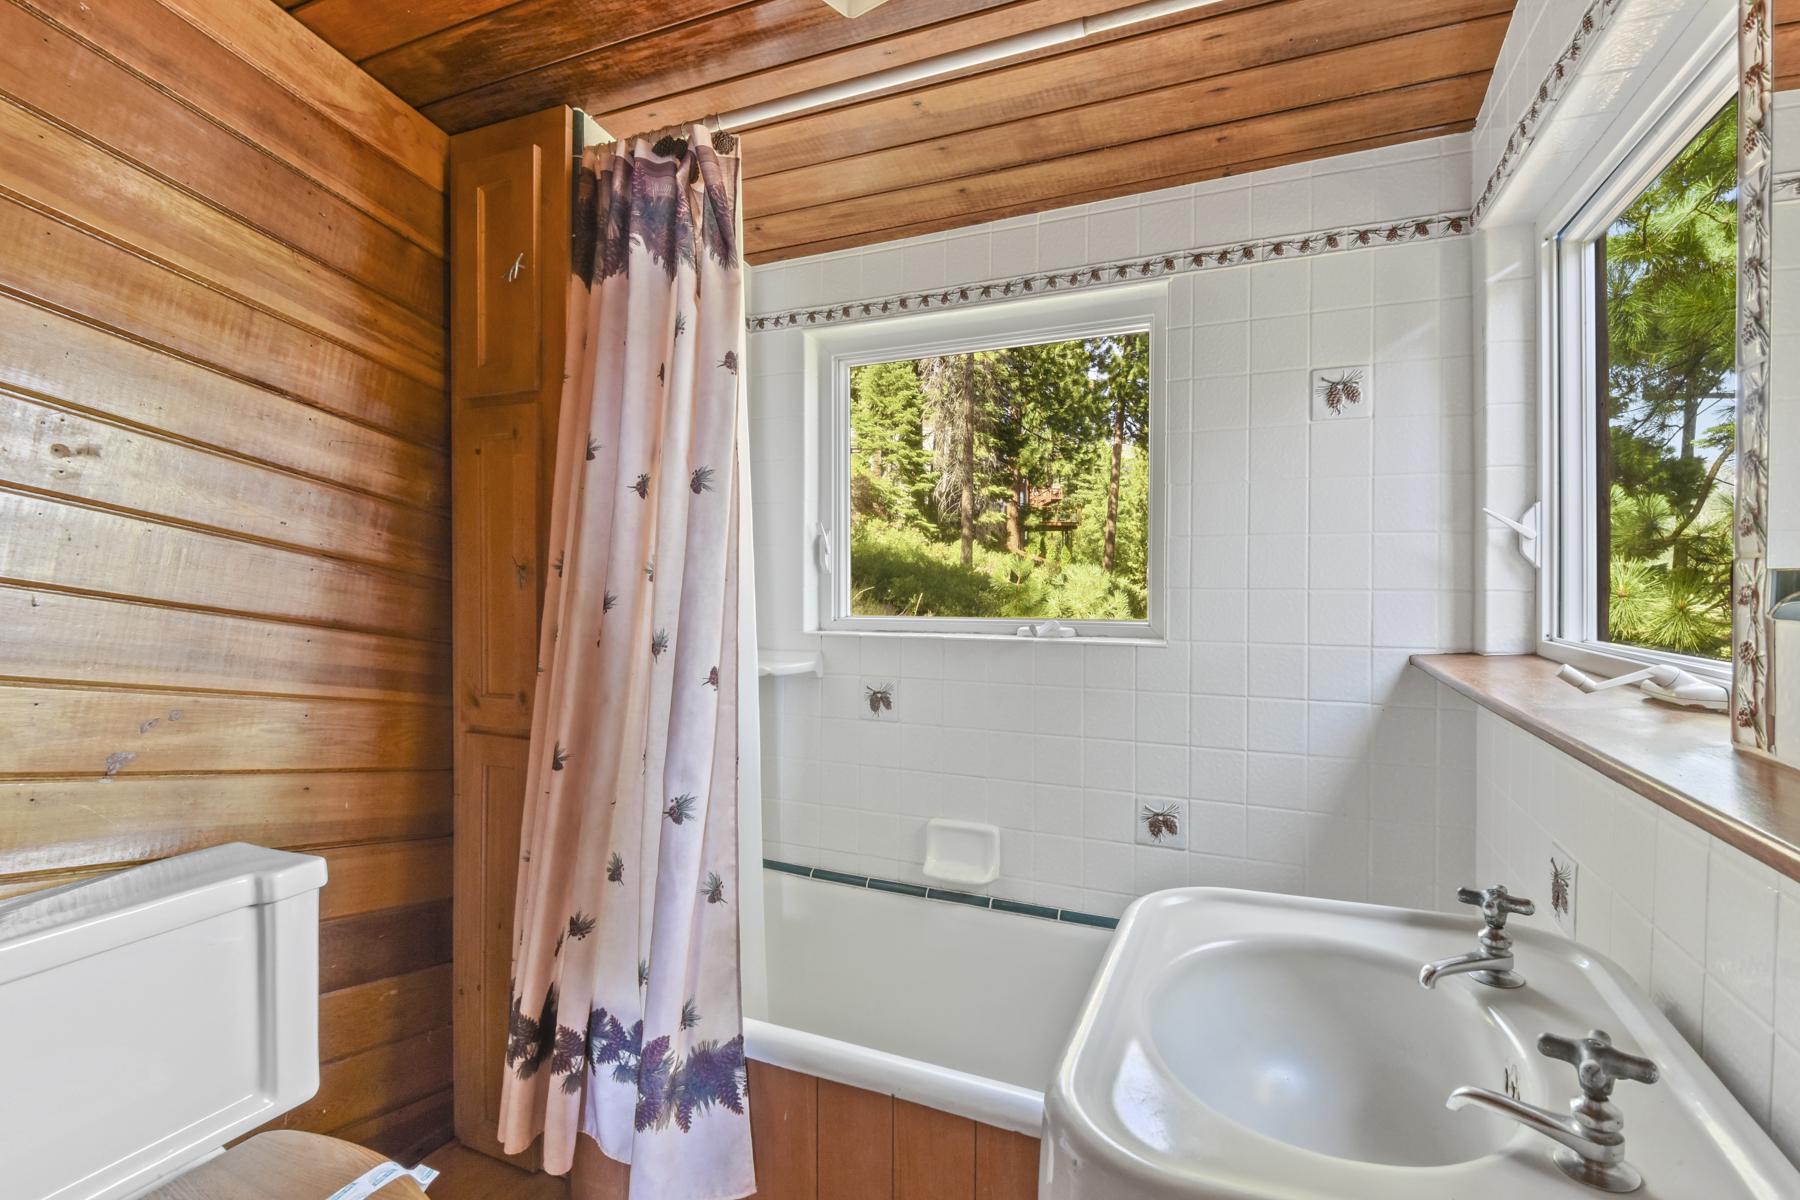 Additional photo for property listing at 354 Wassou Rd., Crystal Bay 354 Wassou Road Crystal Bay, Nevada 89402 United States